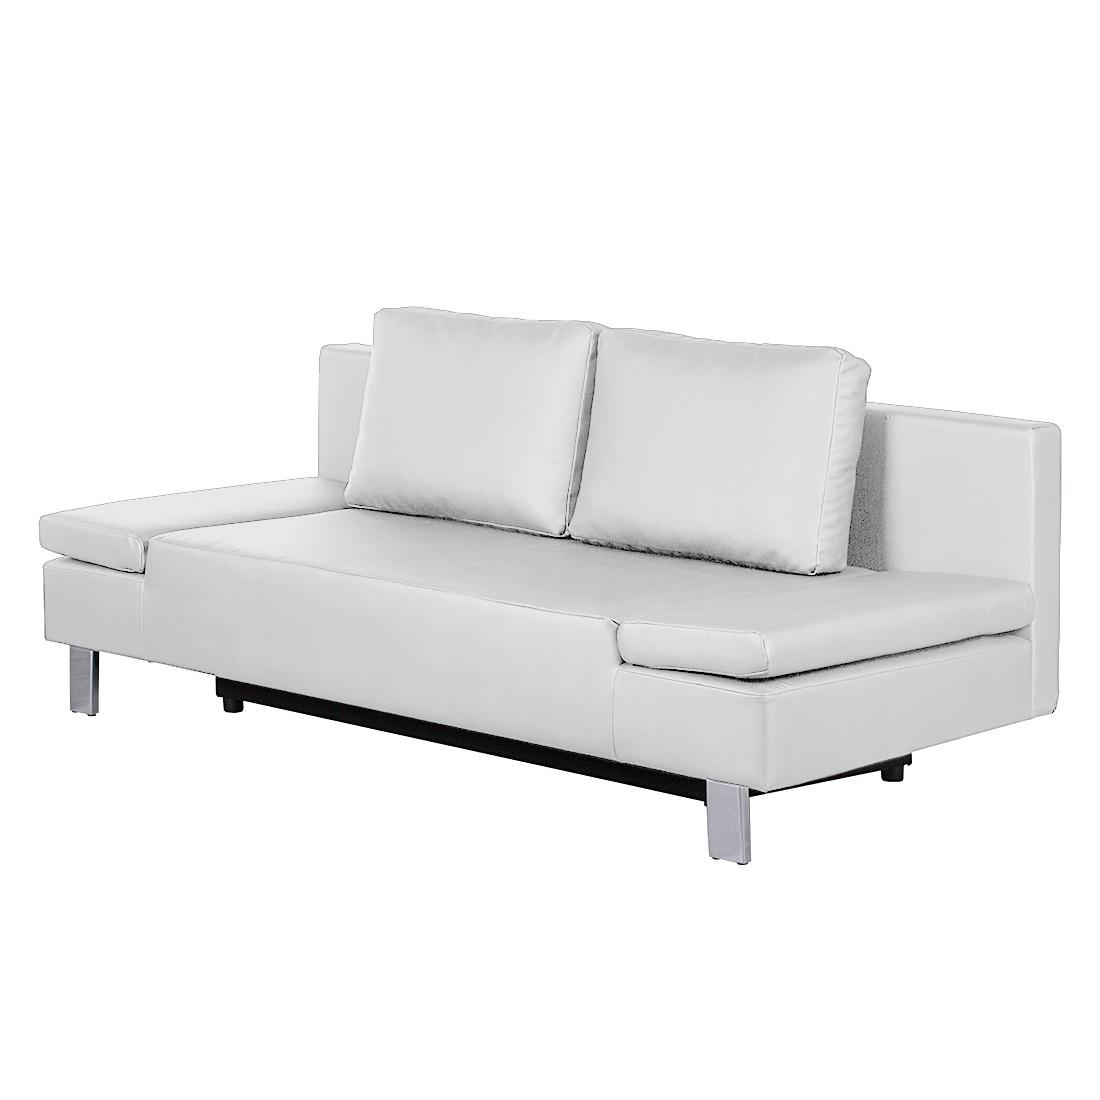 Canapé convertible Lodi - Imitation cuir - Blanc, roomscape